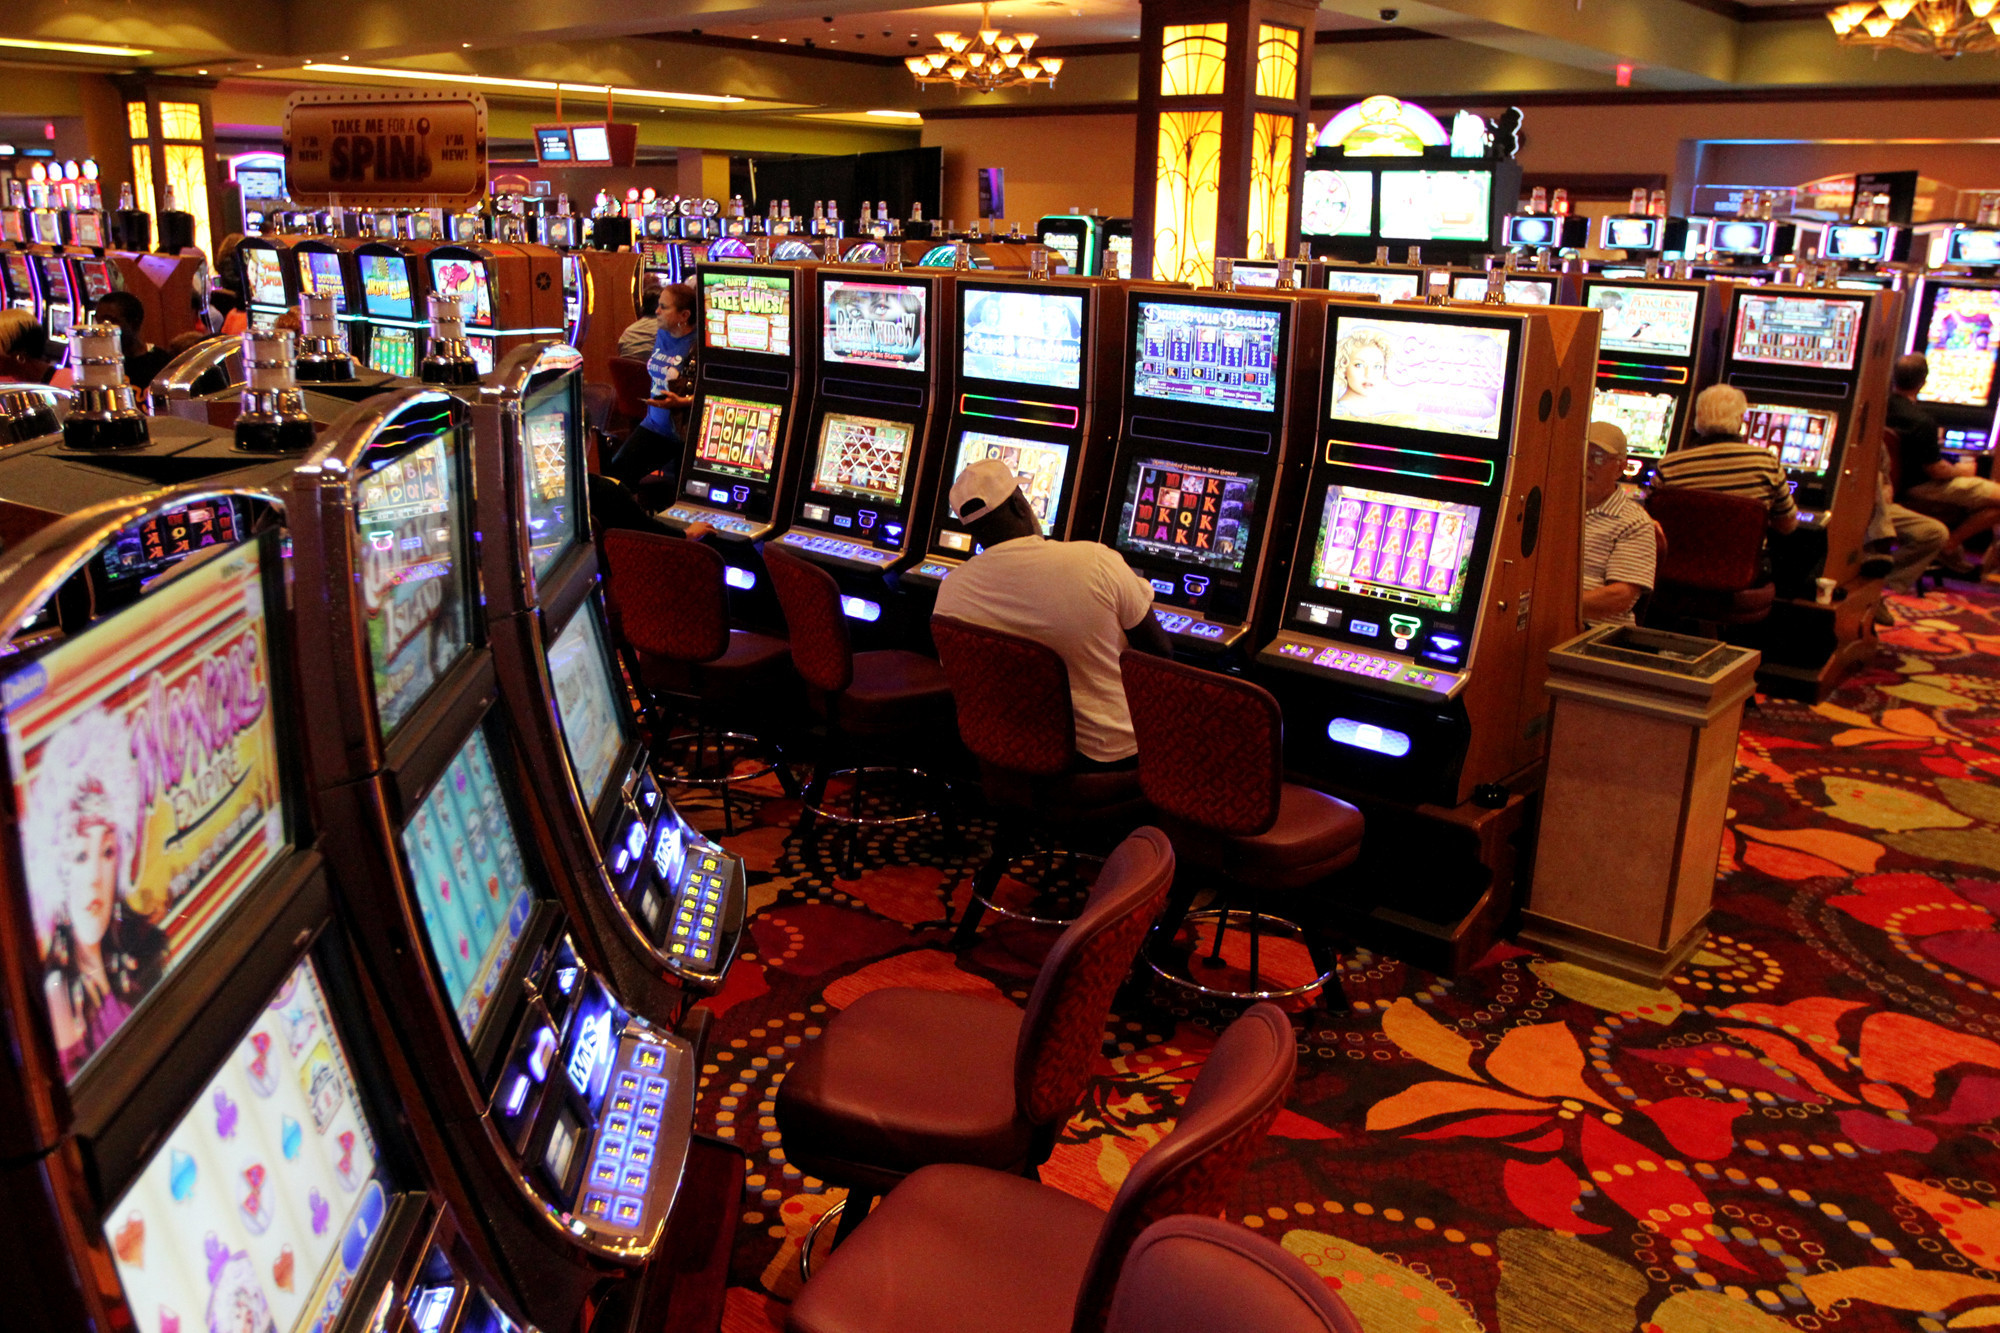 Boca raton casino cruise extreme online casino